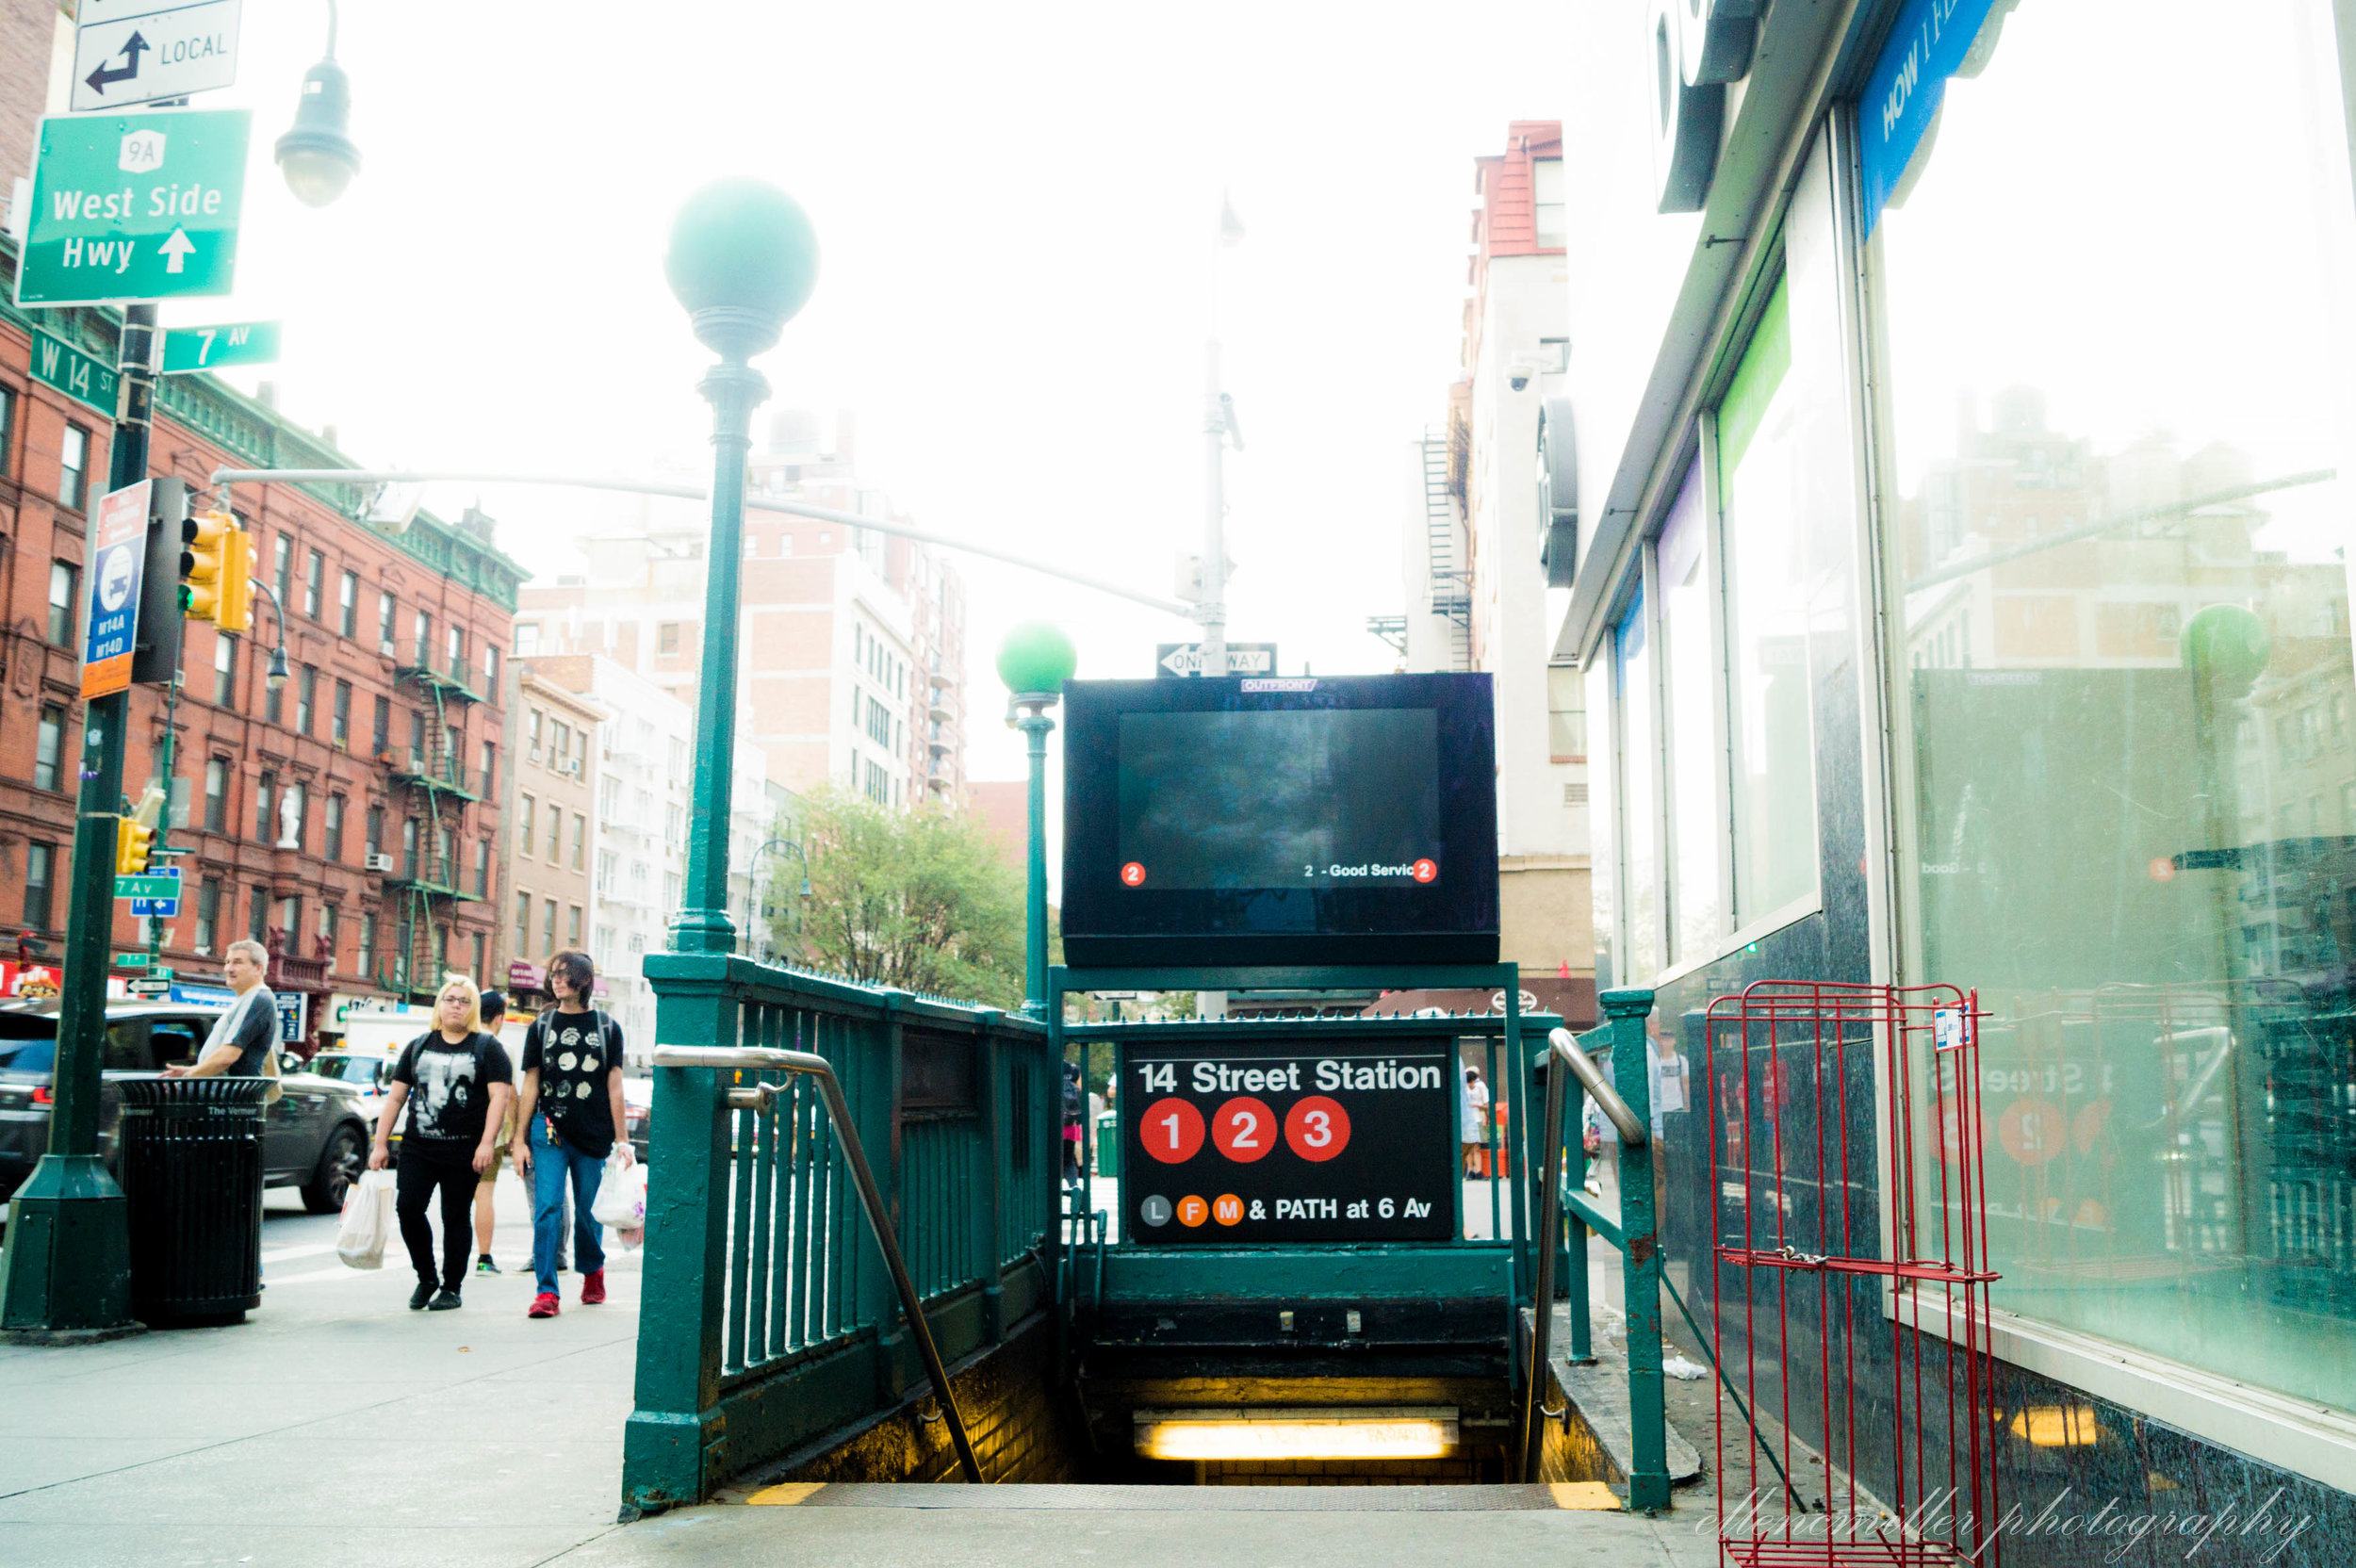 20160921-NYC-78.jpg